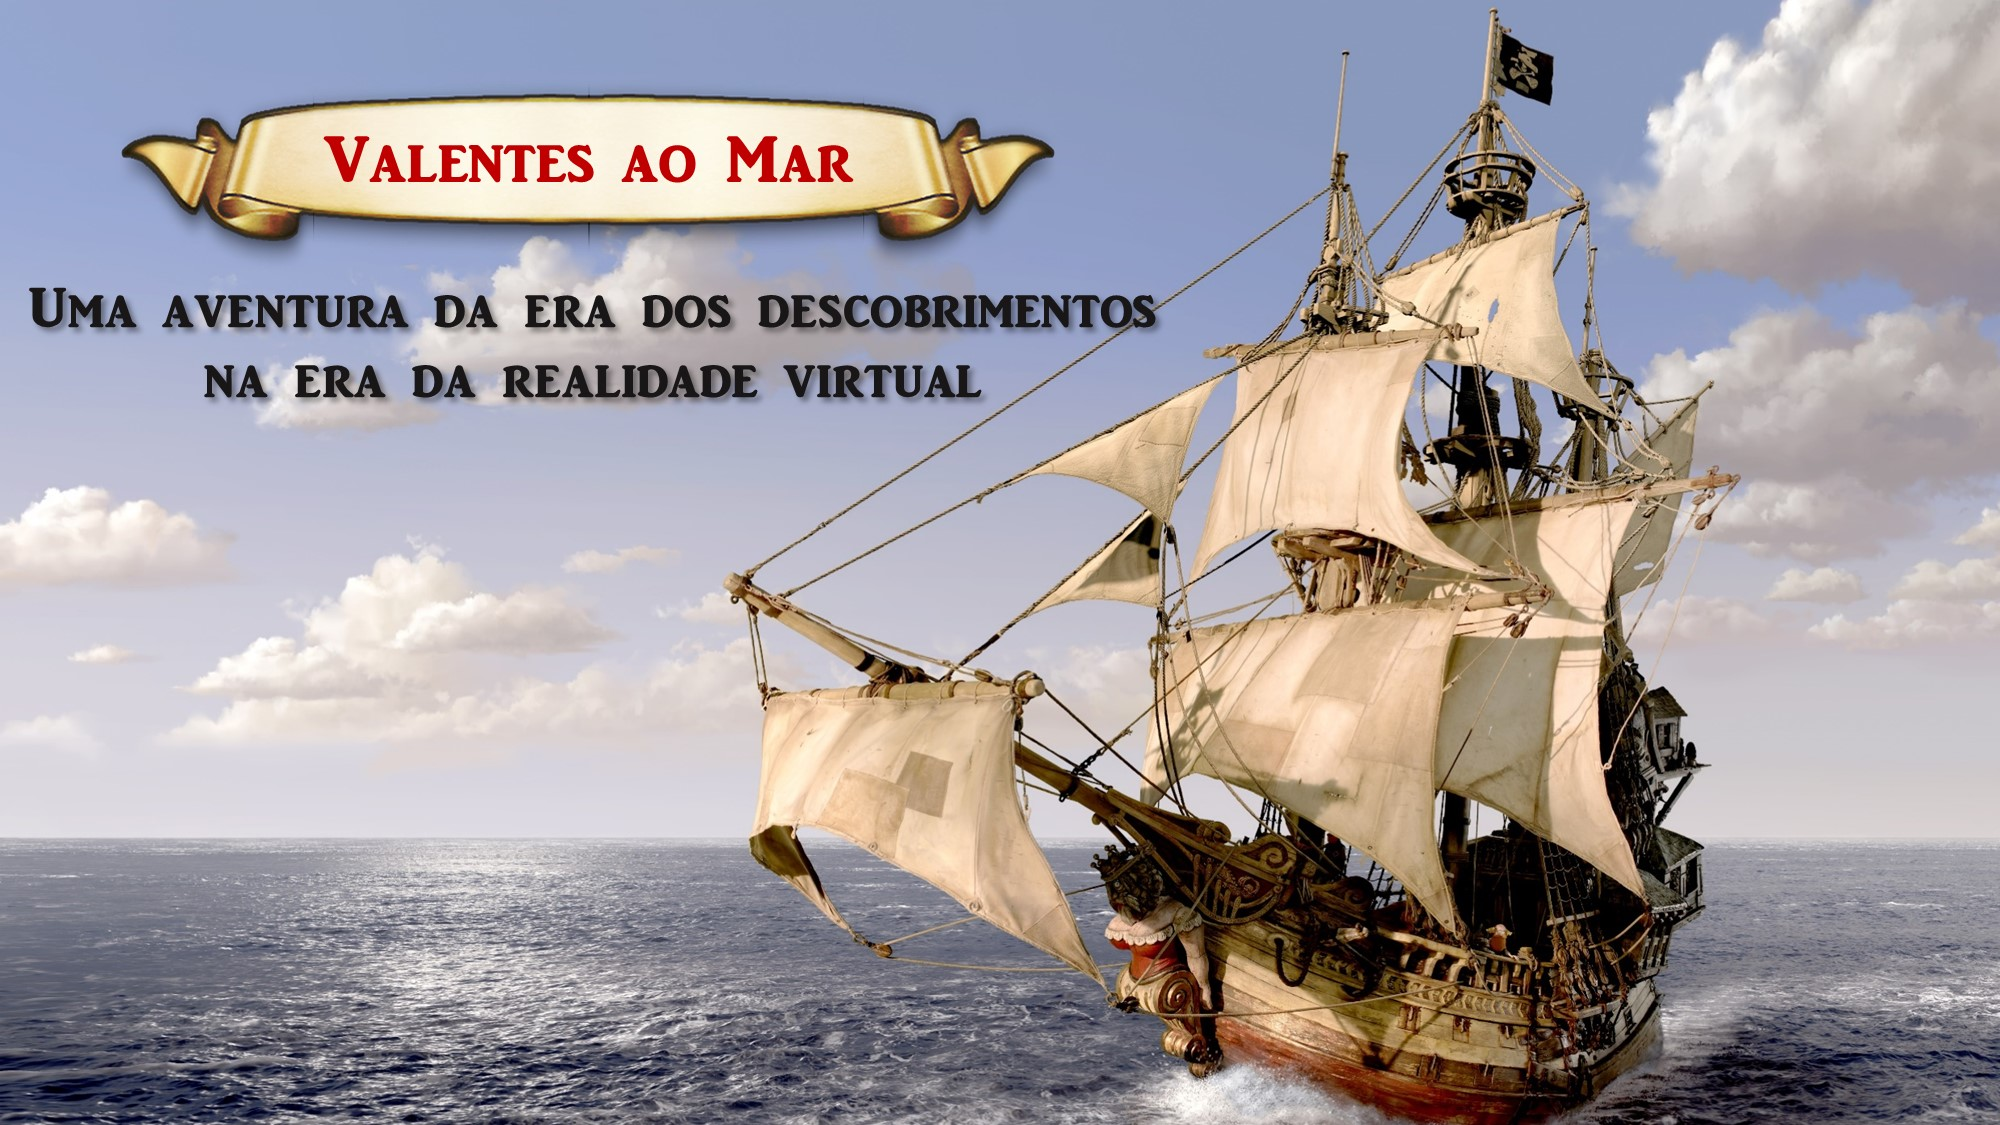 Valentes ao Mar - VR Experience